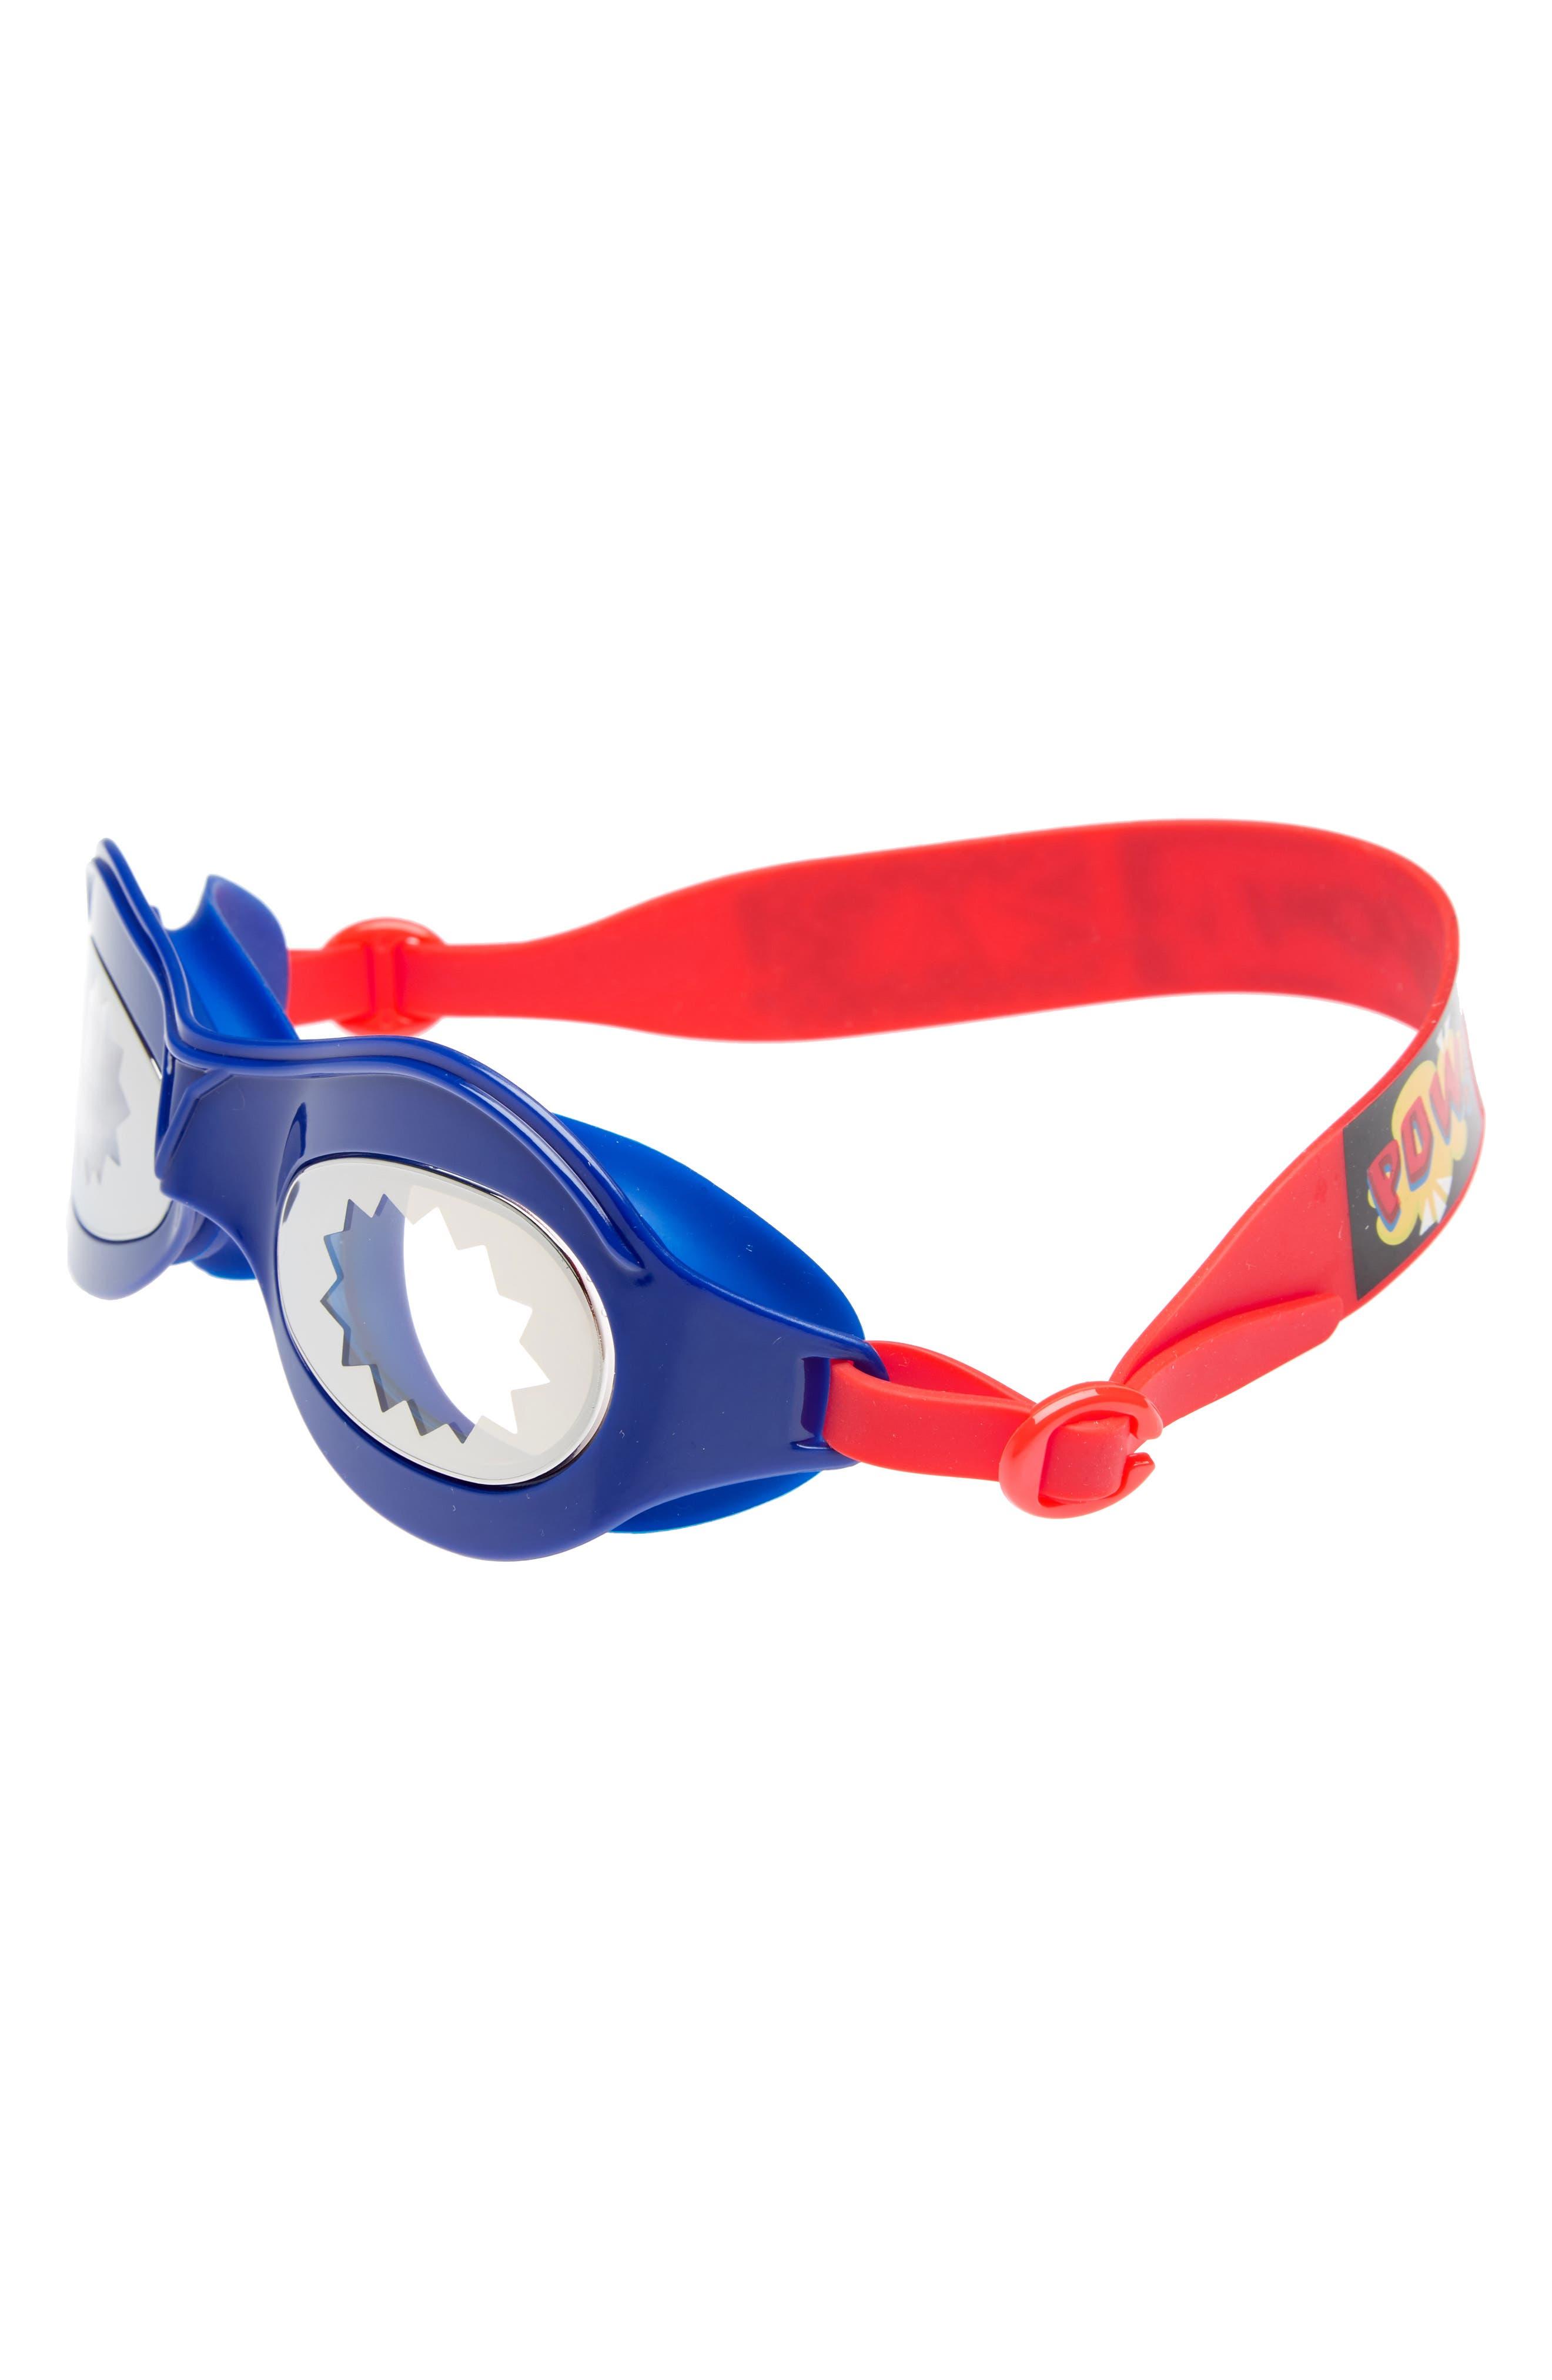 Bling2o Atomic Comic Swim Goggles (Kids)